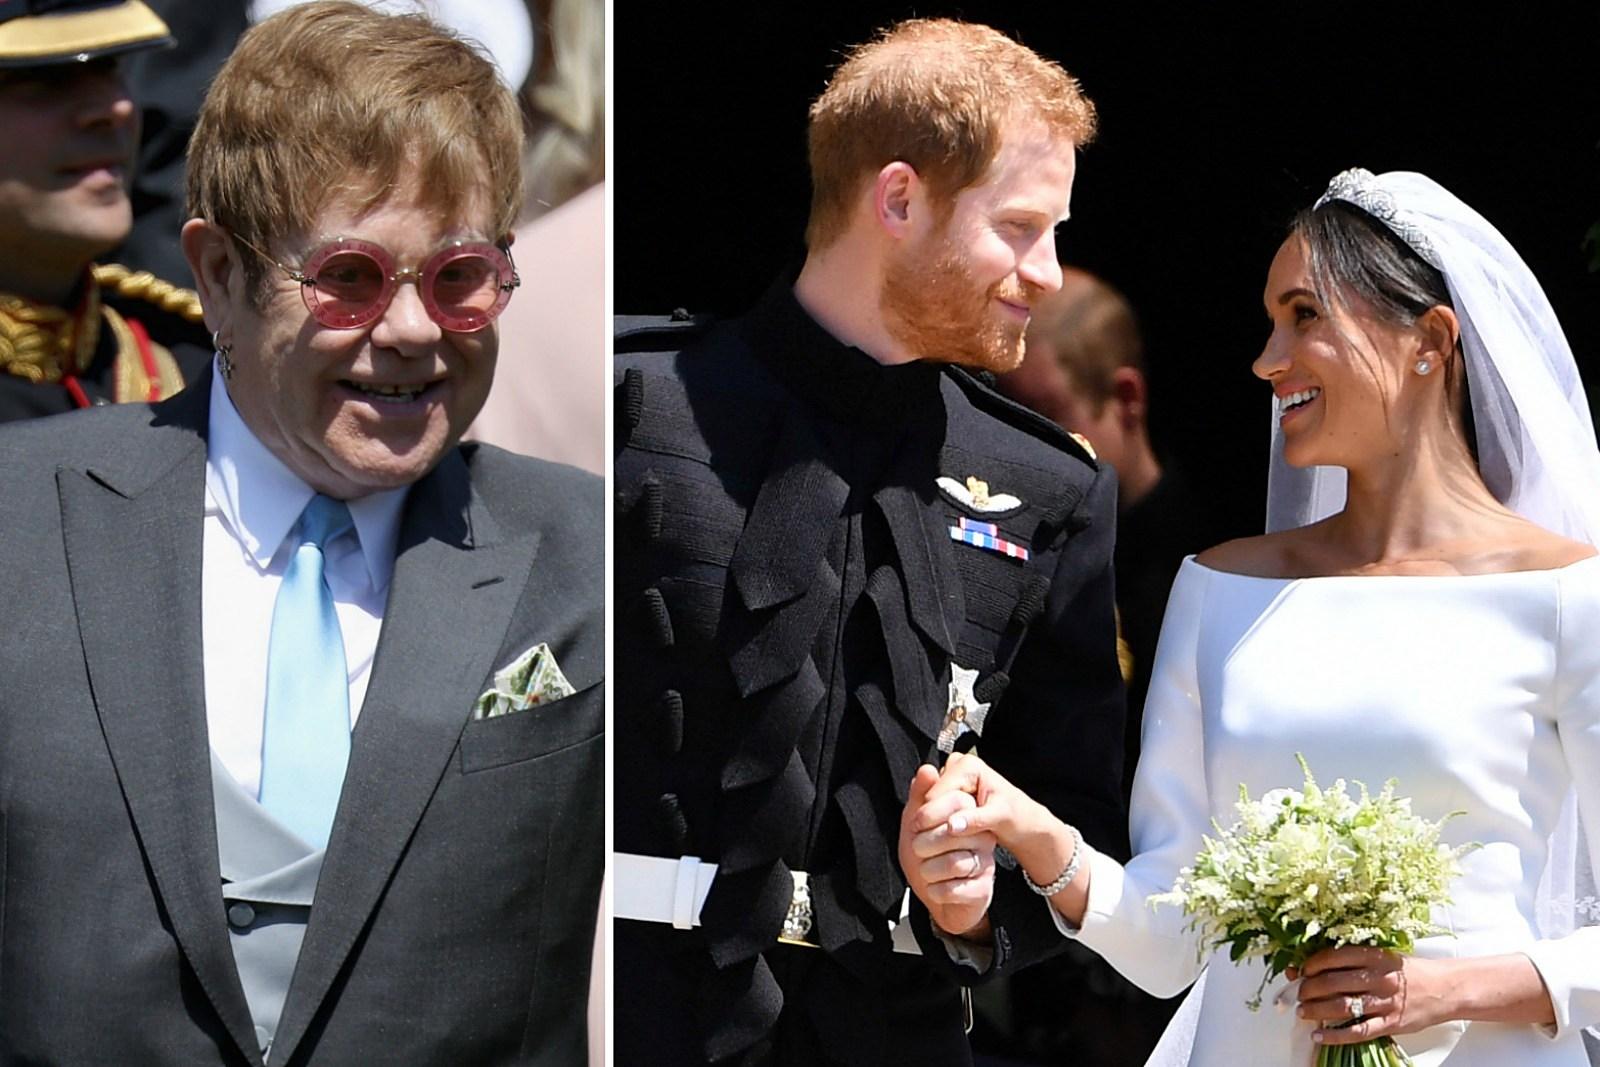 Elton John Performs 'Your Song' at Royal Wedding